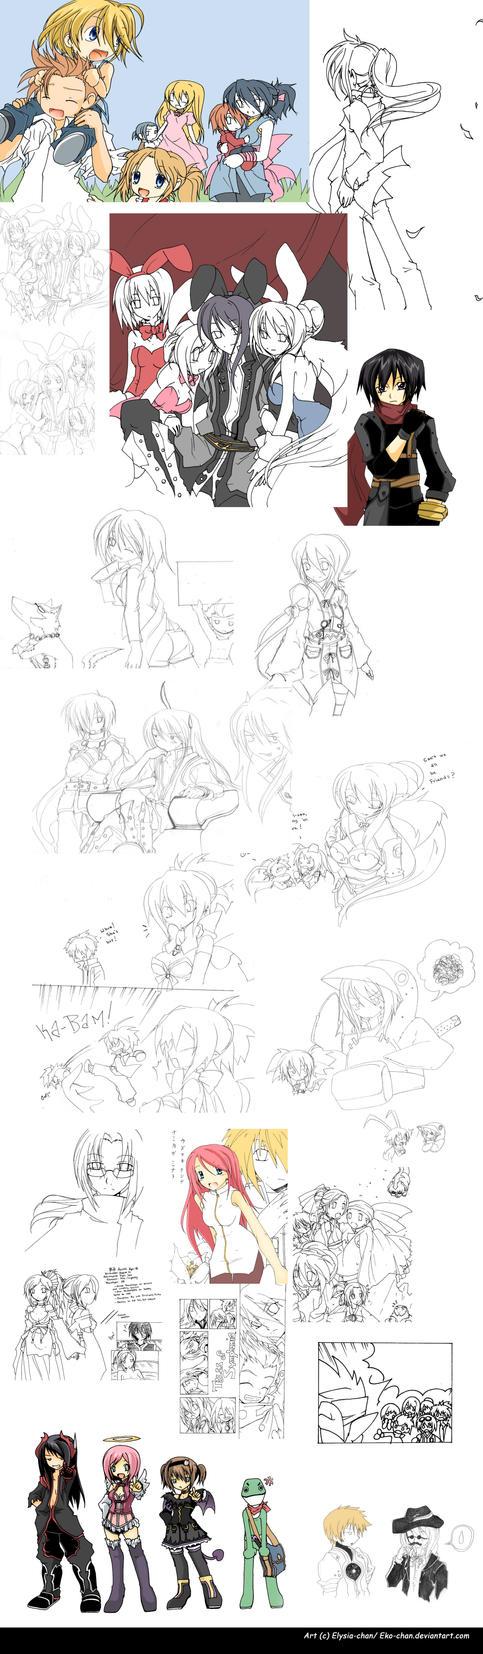 Yuri And Flynn Mystic Arte Art Dump Part By Eko Chan